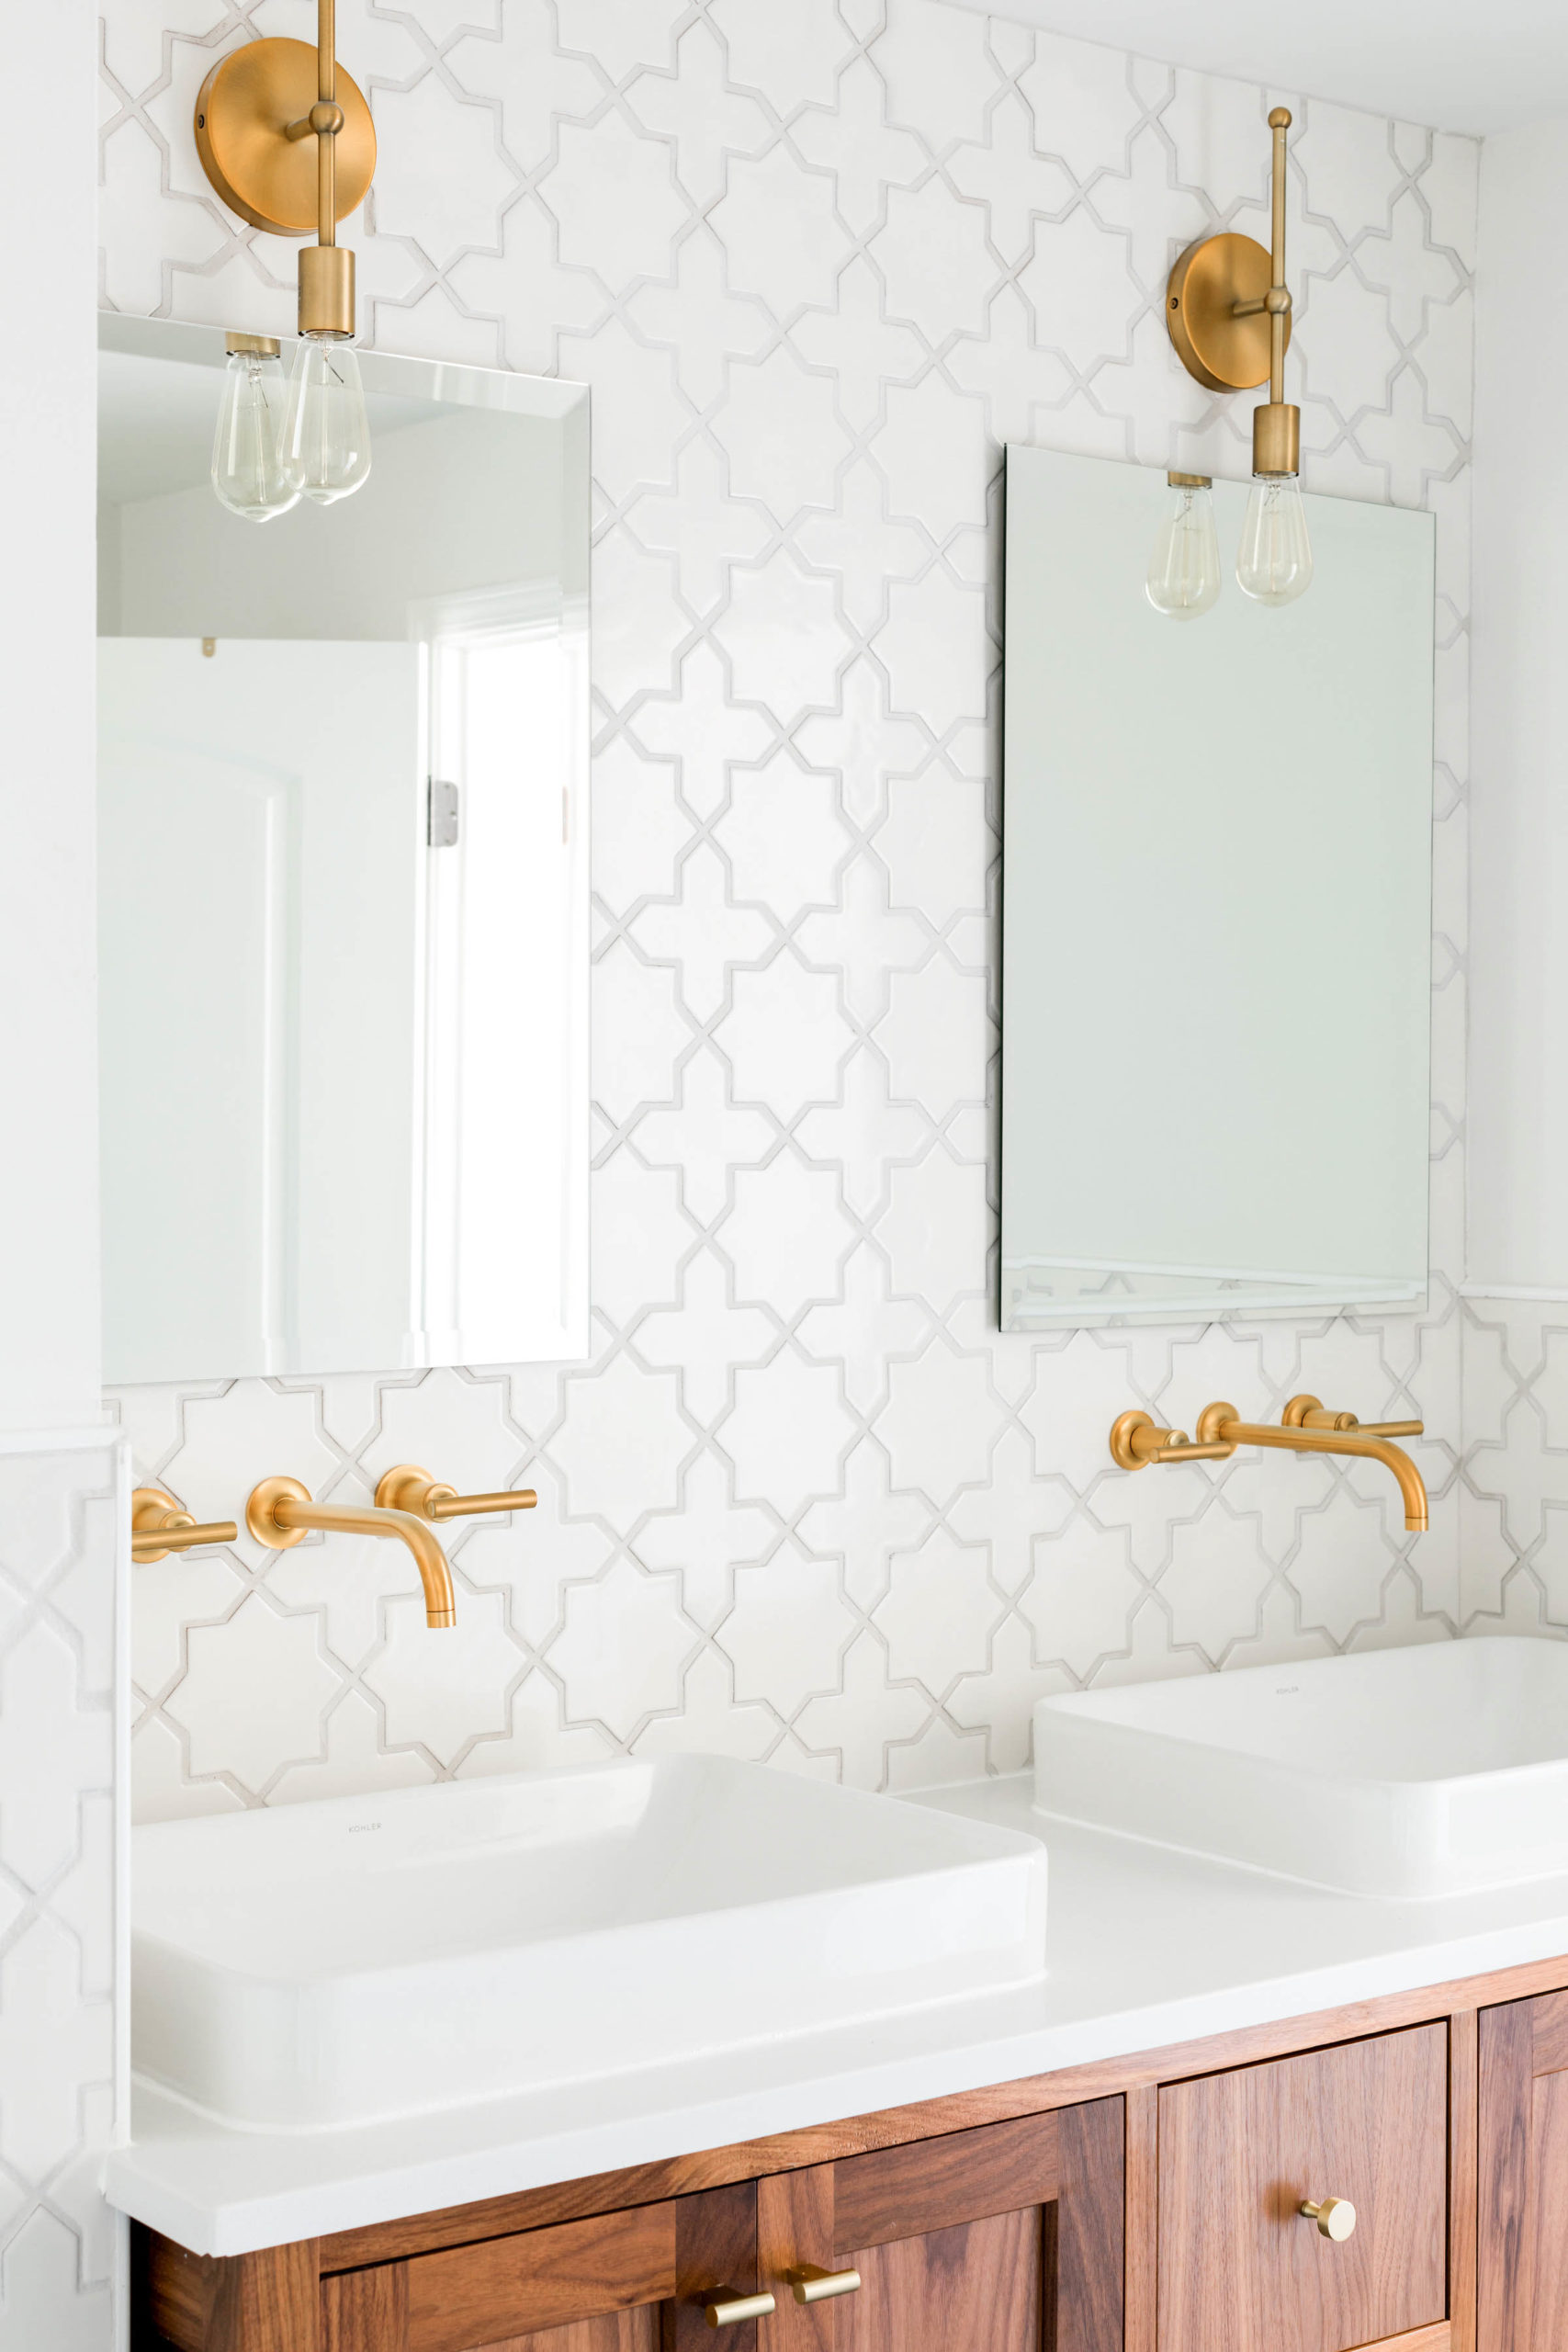 https inhonorofdesign com 2020 02 budget friendly bathroom tile tips to consider